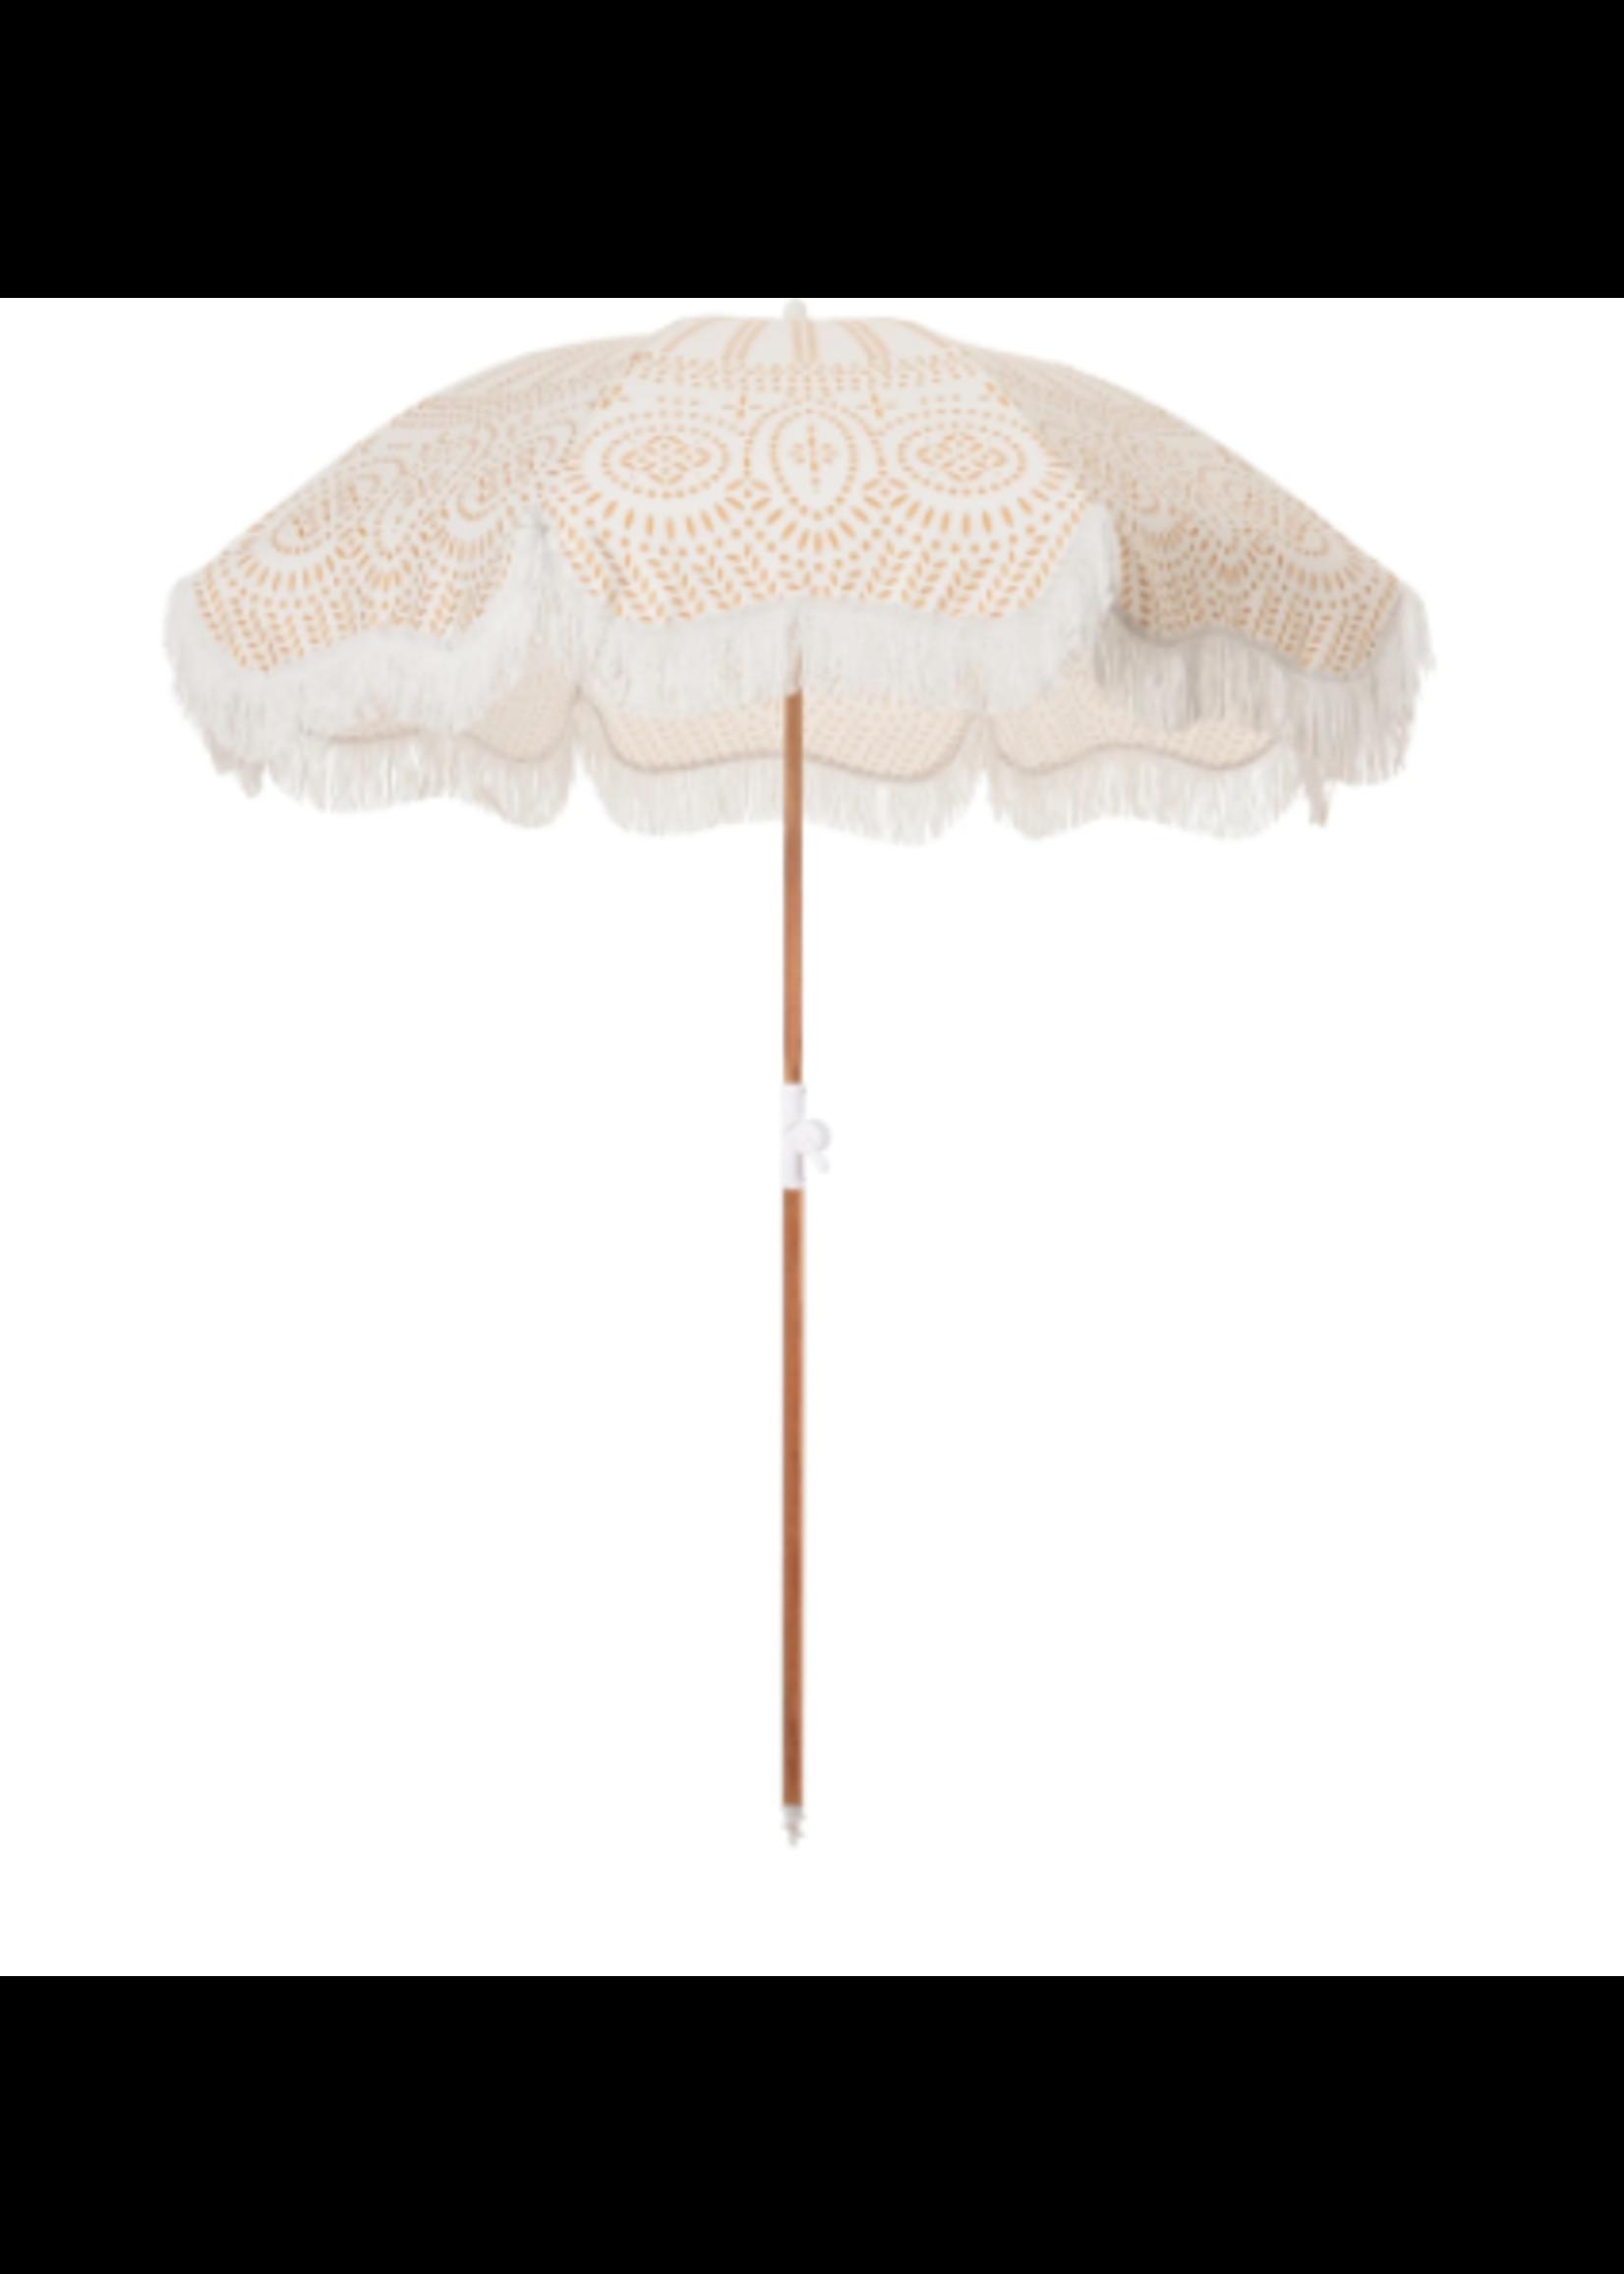 Holiday Beach Umbrella - Eyelet